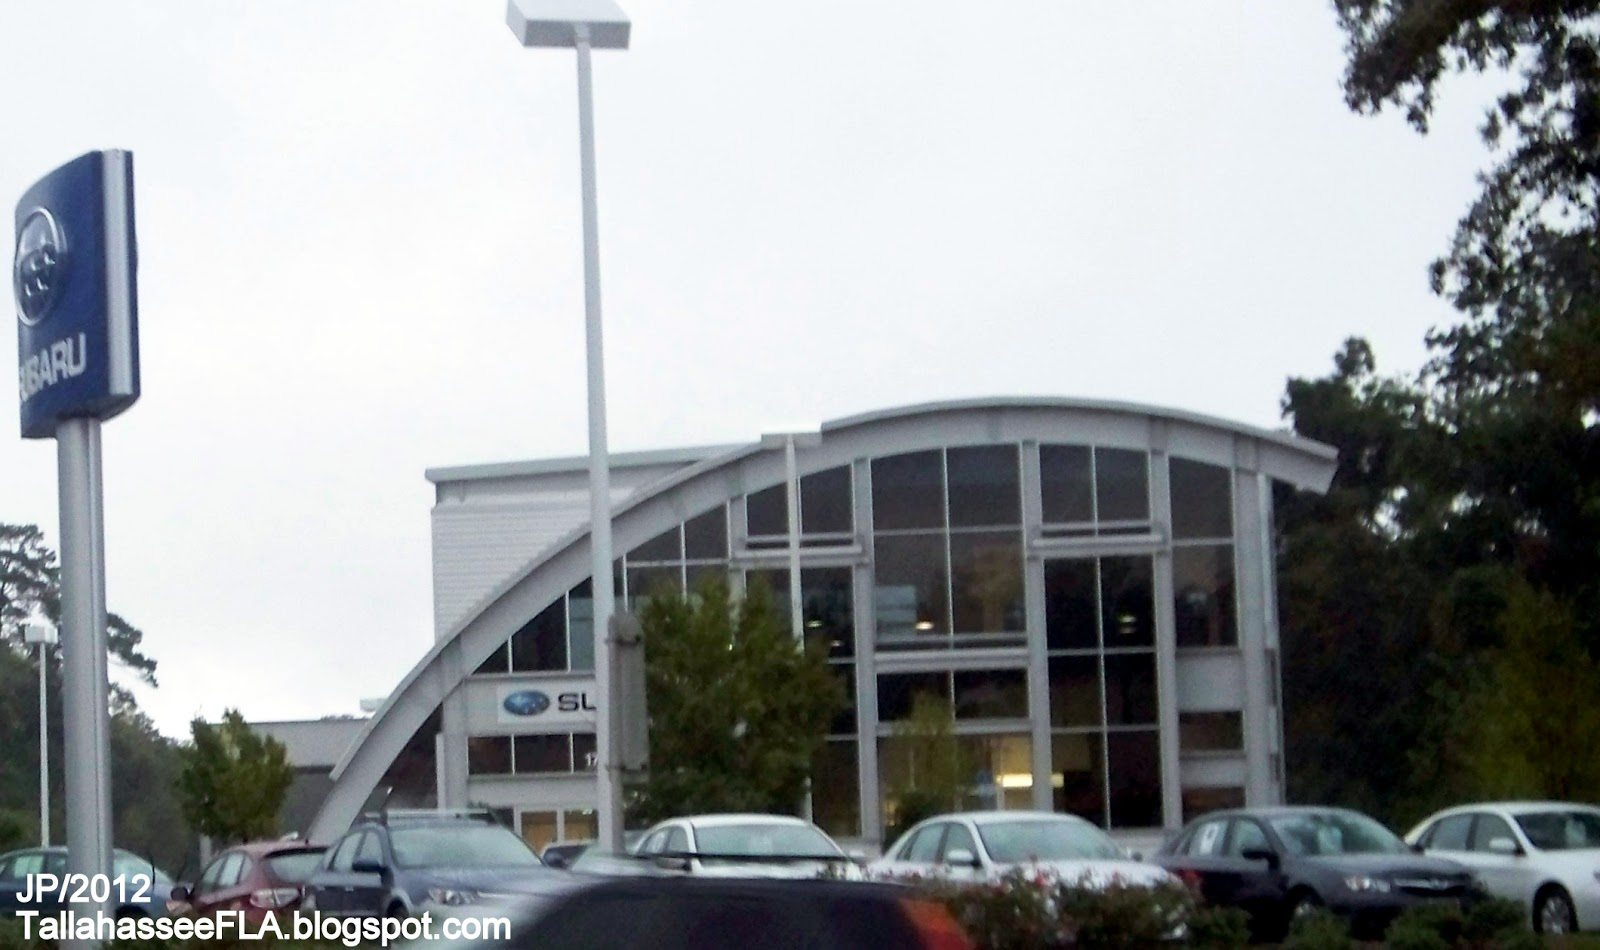 tallahassee florida leon co state university restaurant hospital government dept phone bank. Black Bedroom Furniture Sets. Home Design Ideas